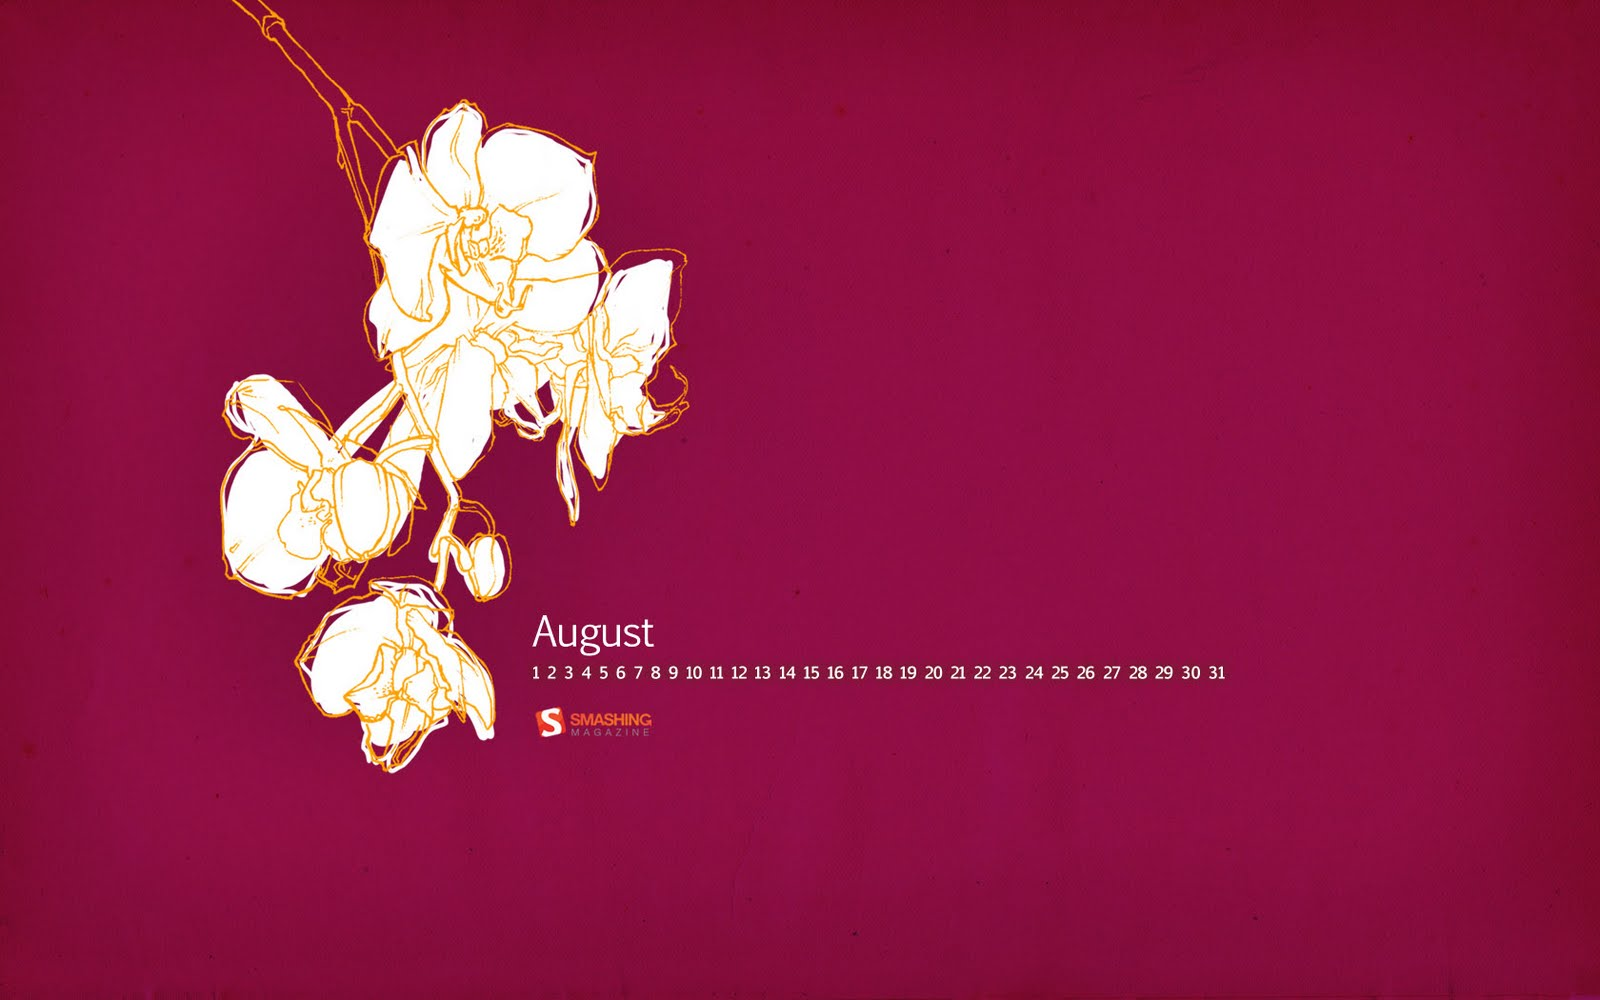 http://2.bp.blogspot.com/-LE1IDAxOeoQ/TkrneXLs_hI/AAAAAAAAAns/Xd6FuLBye1E/s1600/desktop+wall+paper+calendar+smashing+magazine+orchid+august+2011.jpg